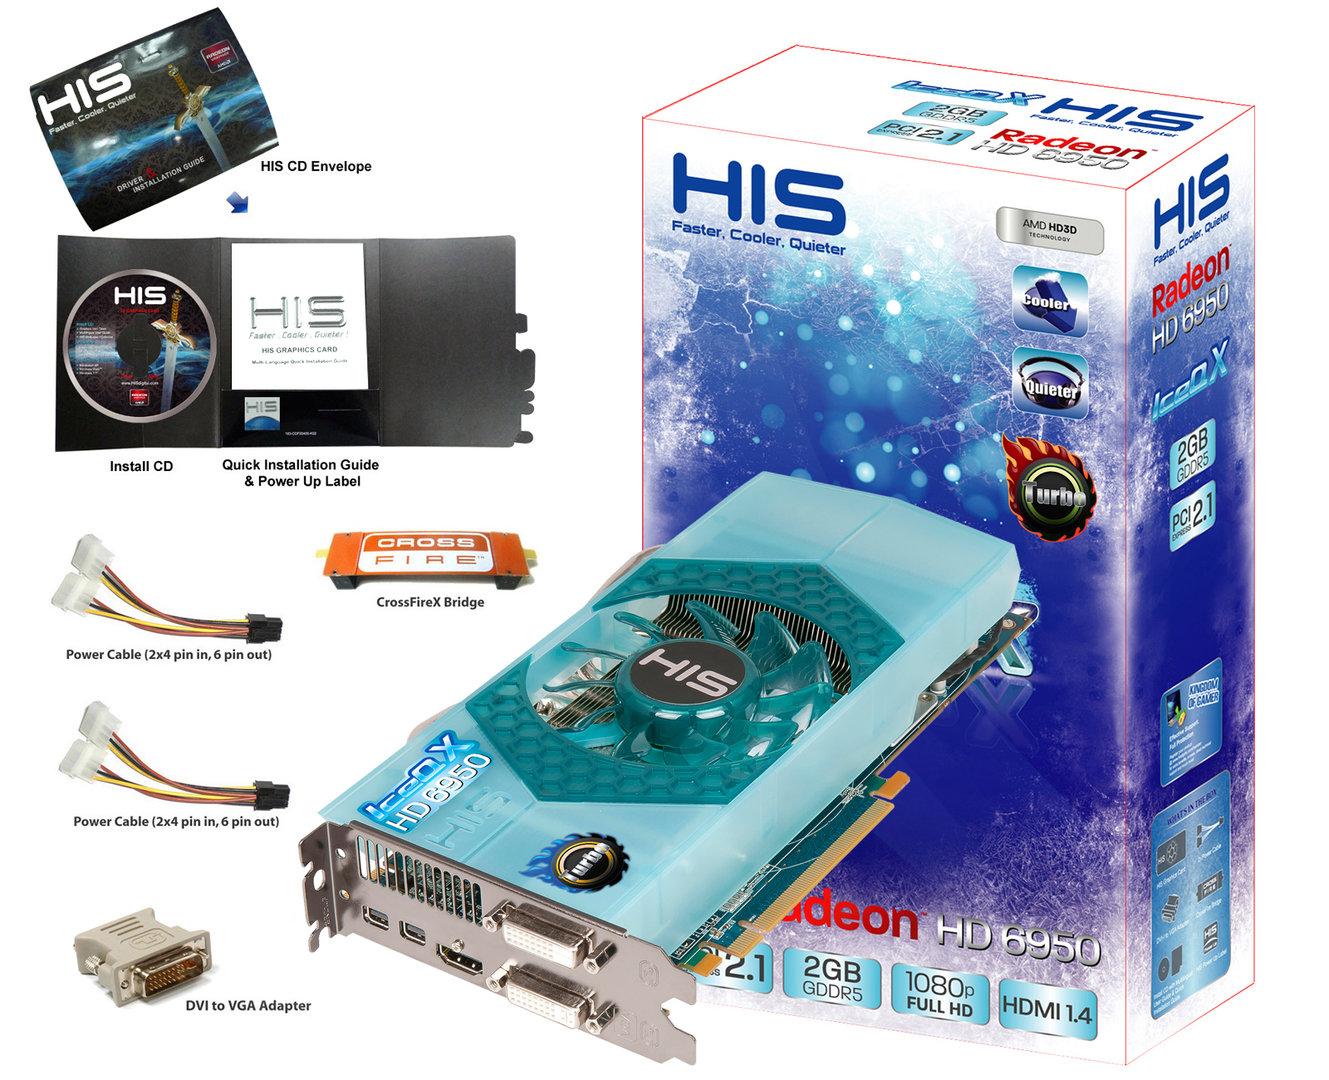 HIS 6950 IceQ X Turbo 1GB/2GB